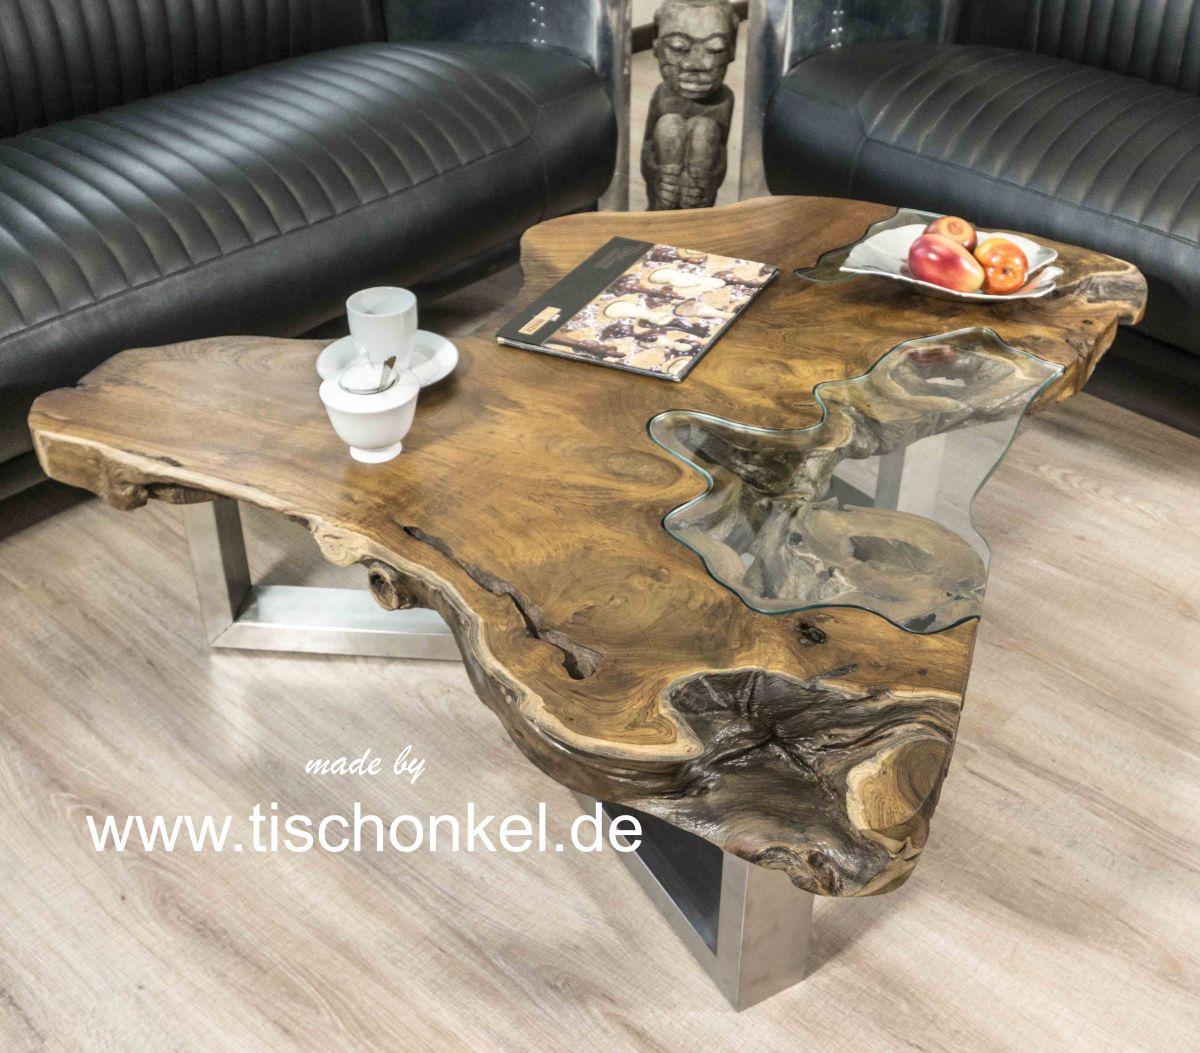 couchtisch aus holz massiv der tischonkel. Black Bedroom Furniture Sets. Home Design Ideas